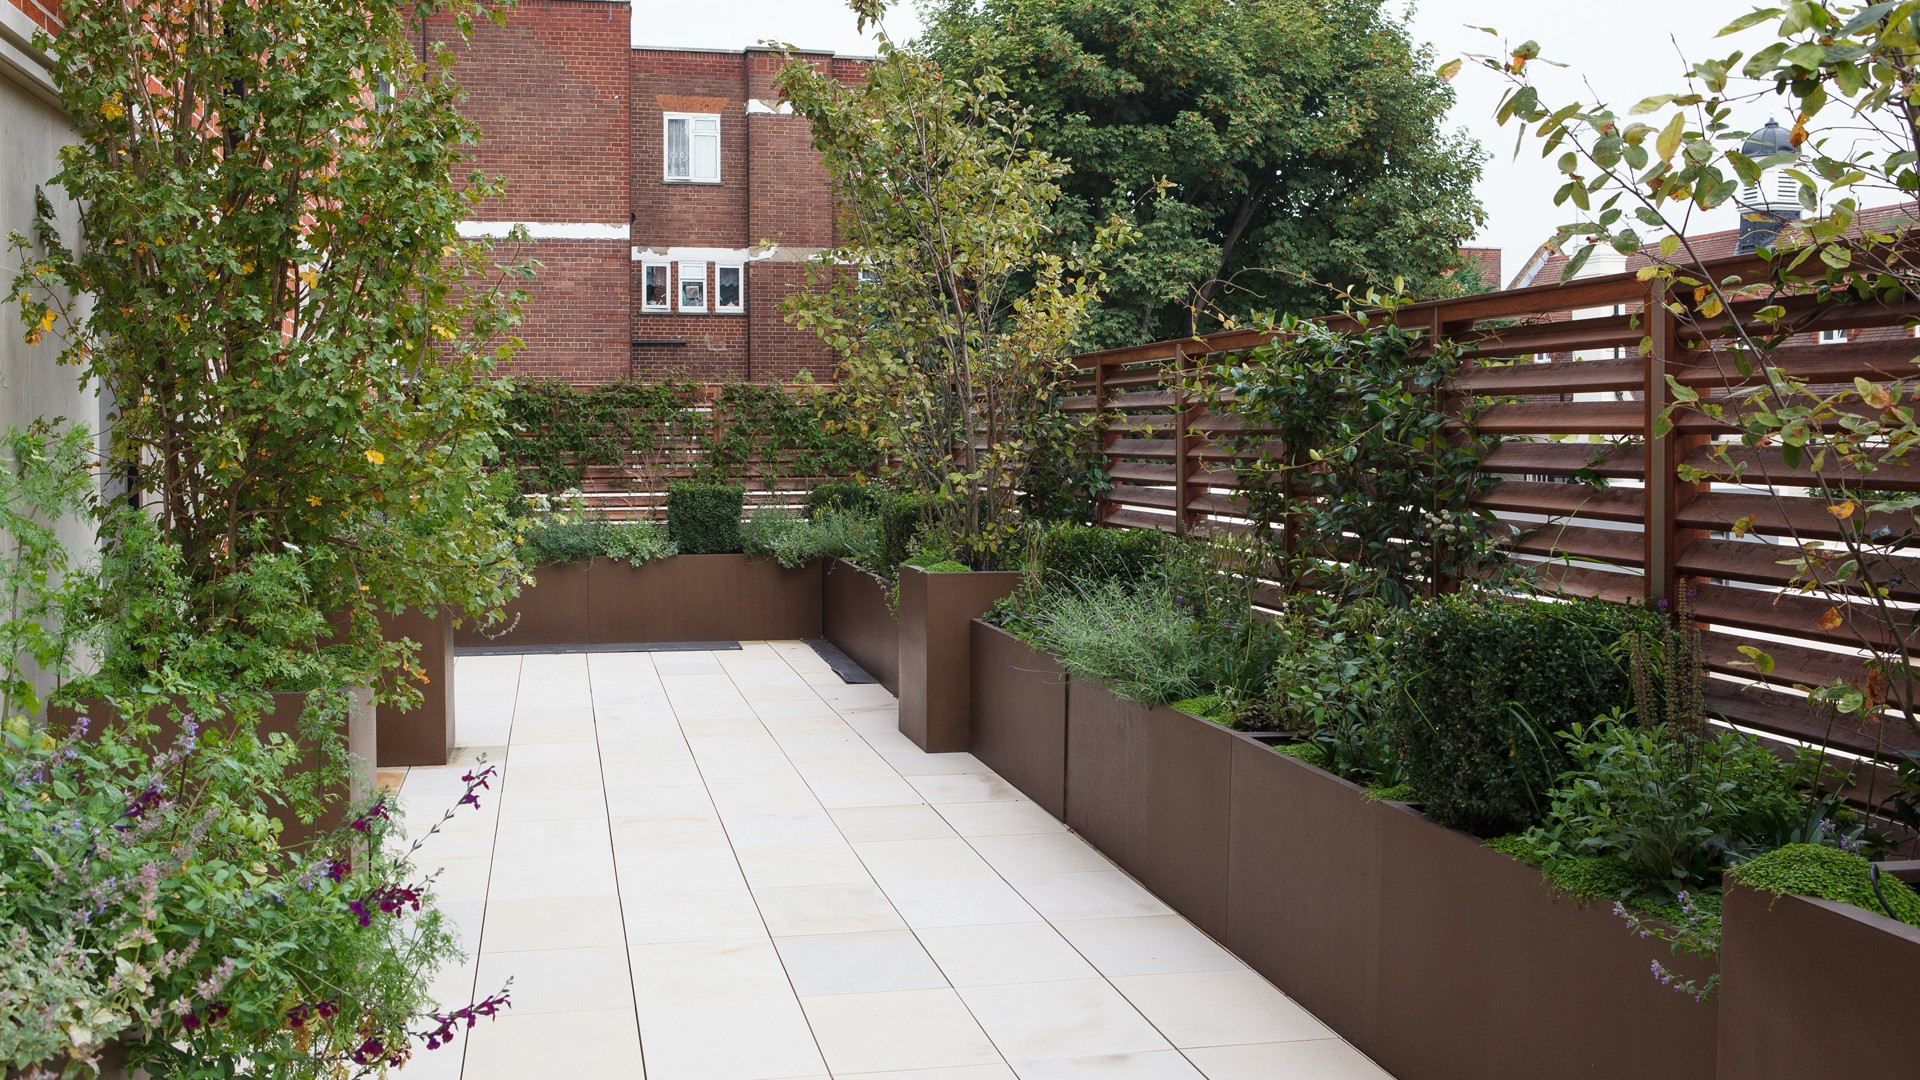 Rooftop Terrace Landscape  Modern Roof Terrace Planters Randle Siddeley